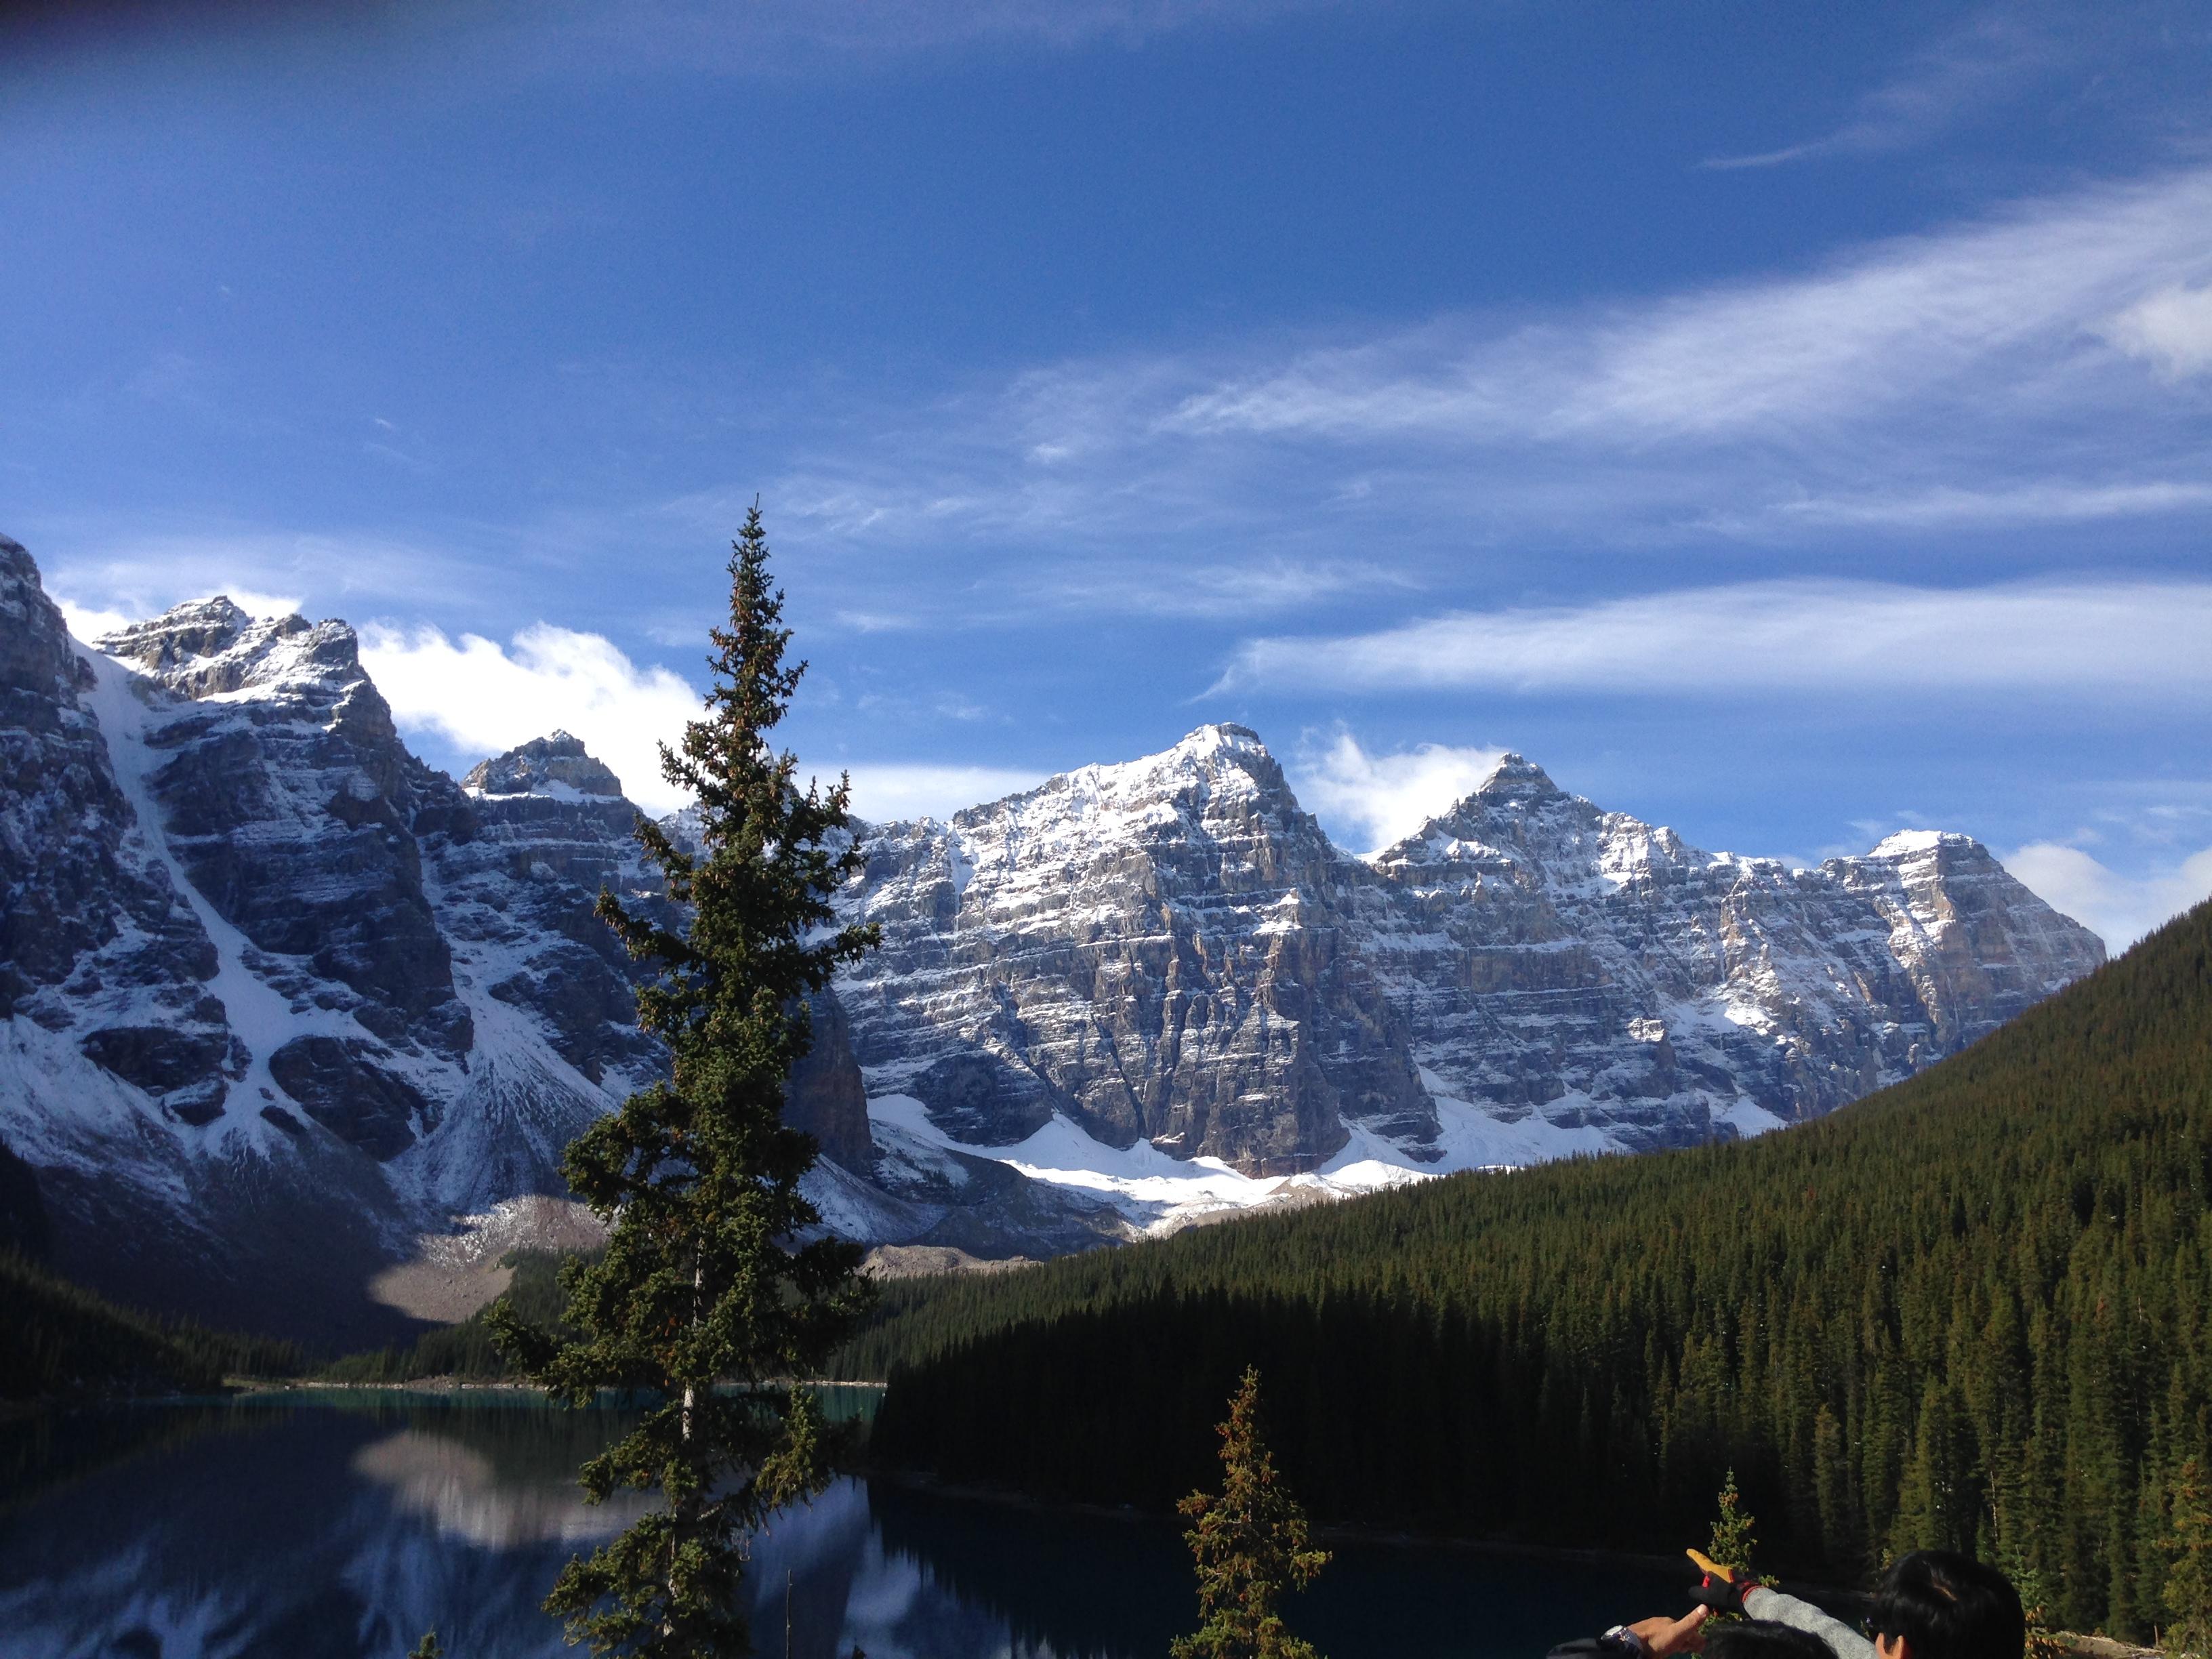 Banff, Calgary, Banff, Calgary, ecetera, ecetera